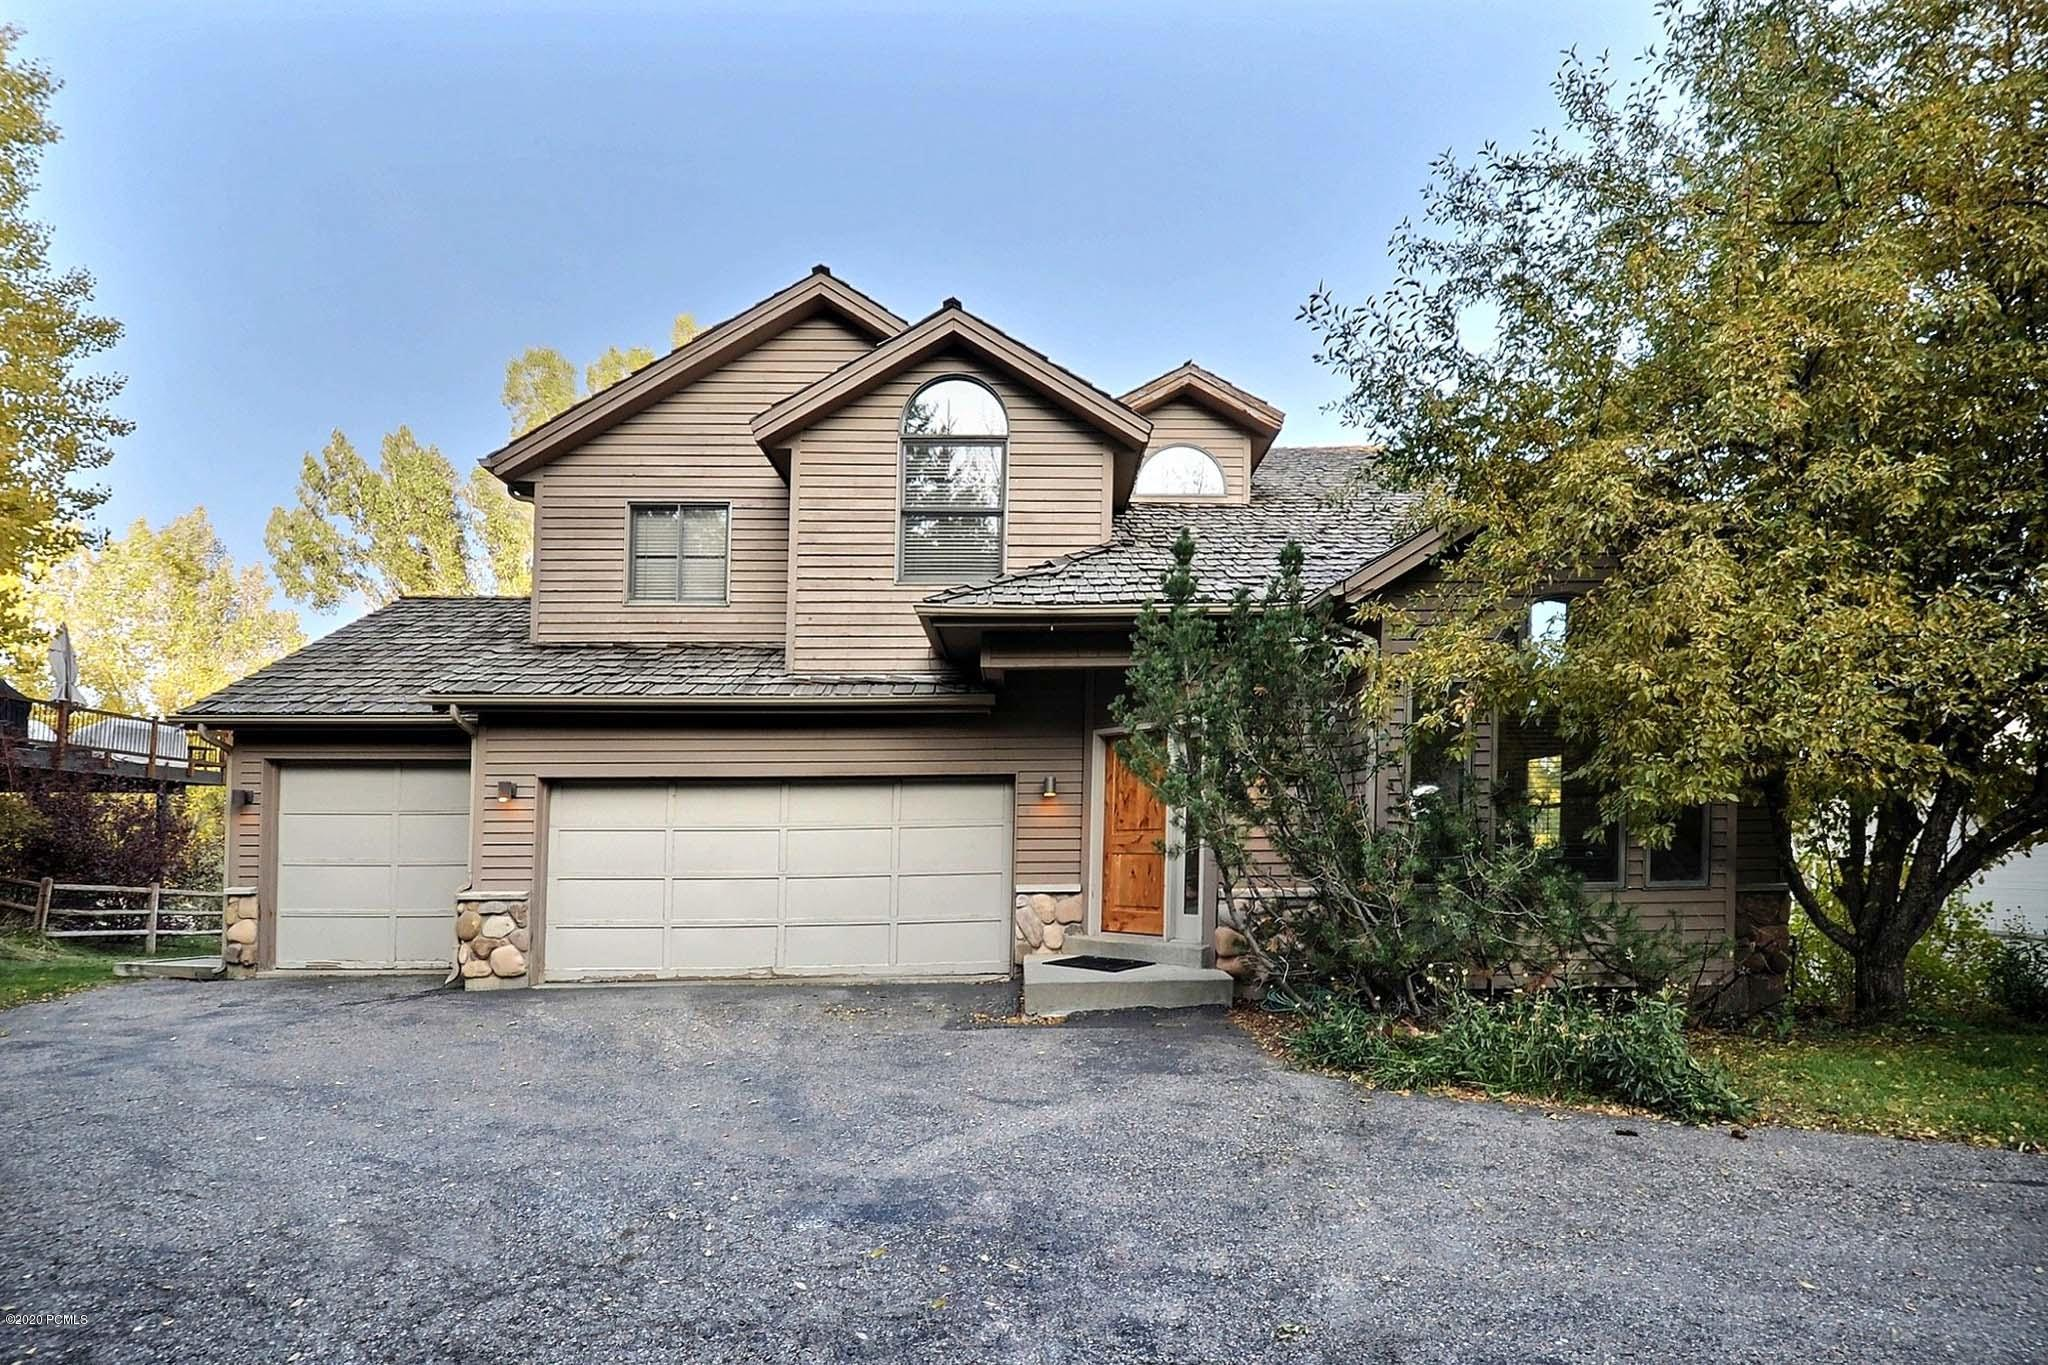 3011 Meadows Drive, Park City, Utah 84060, 5 Bedrooms Bedrooms, ,4 BathroomsBathrooms,Single Family,For Sale,Meadows,12003724